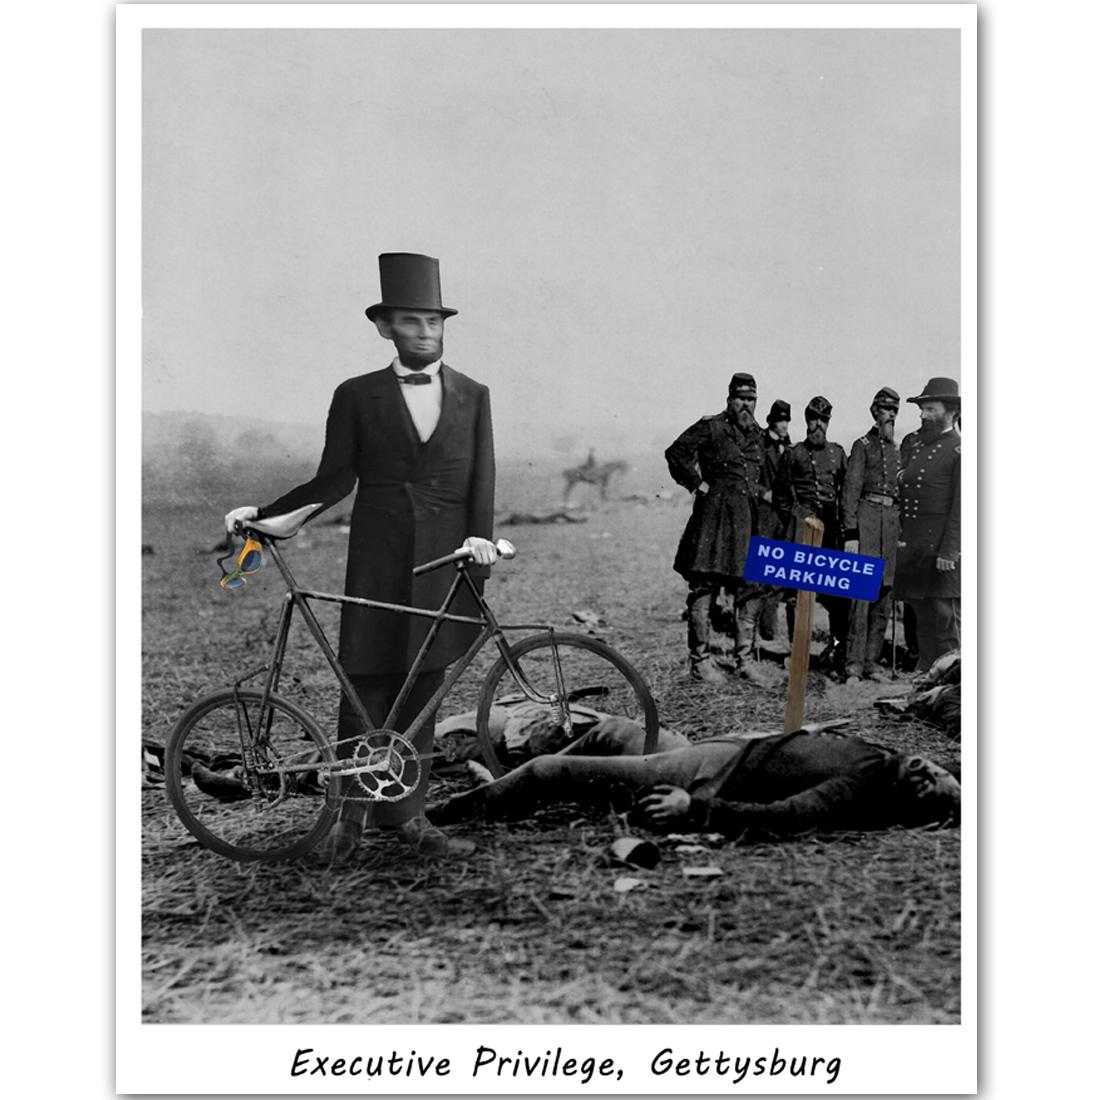 Executive Privilege, Gettysburg